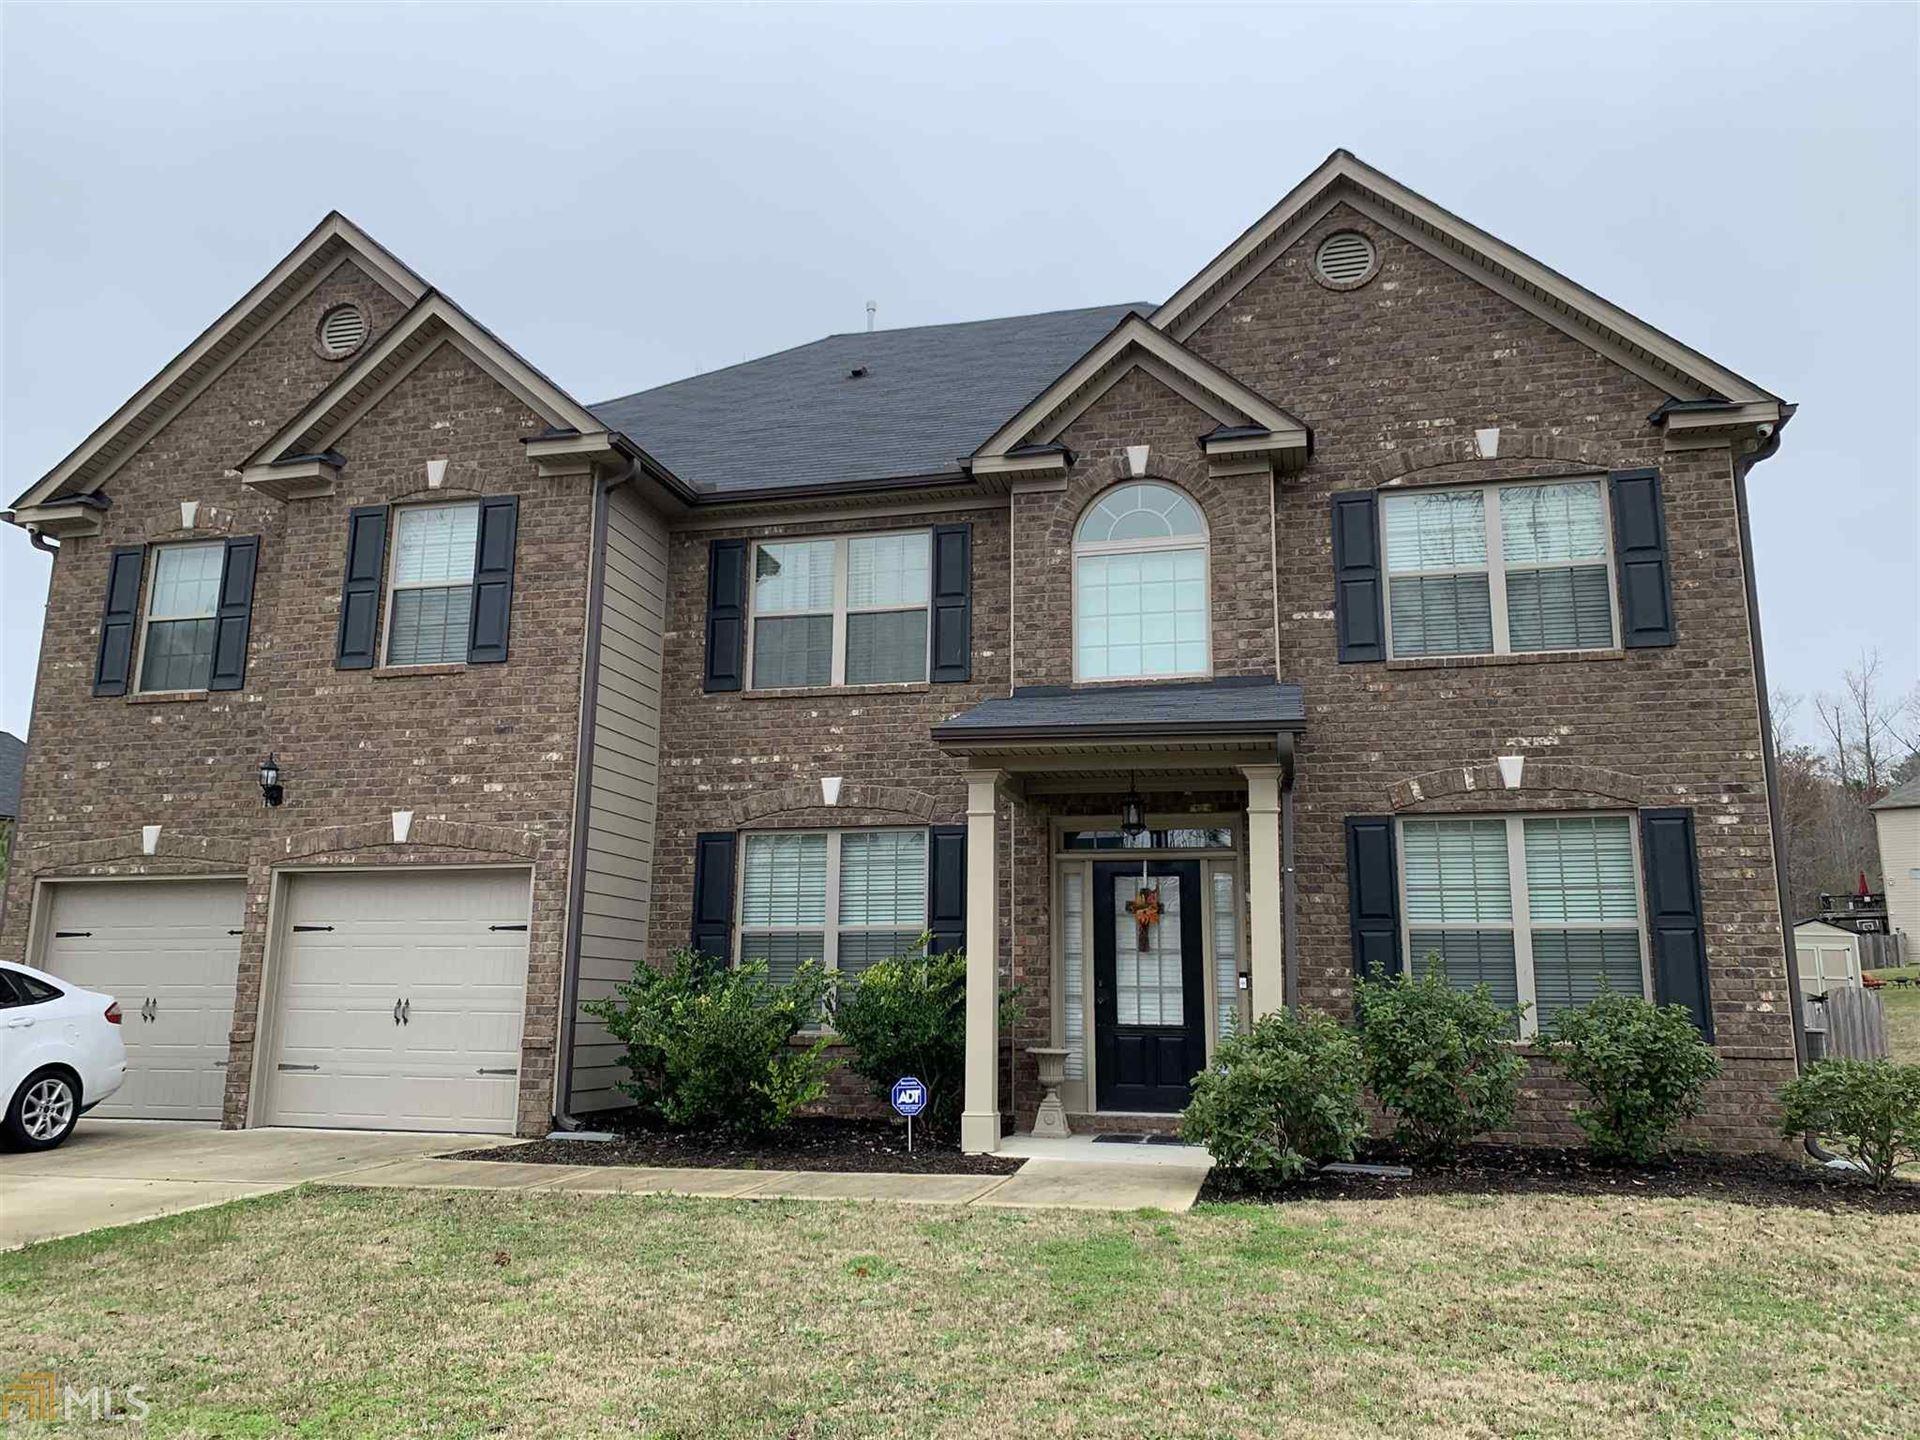 165 Wellstone Pl, Covington, GA 30014 - #: 8738526